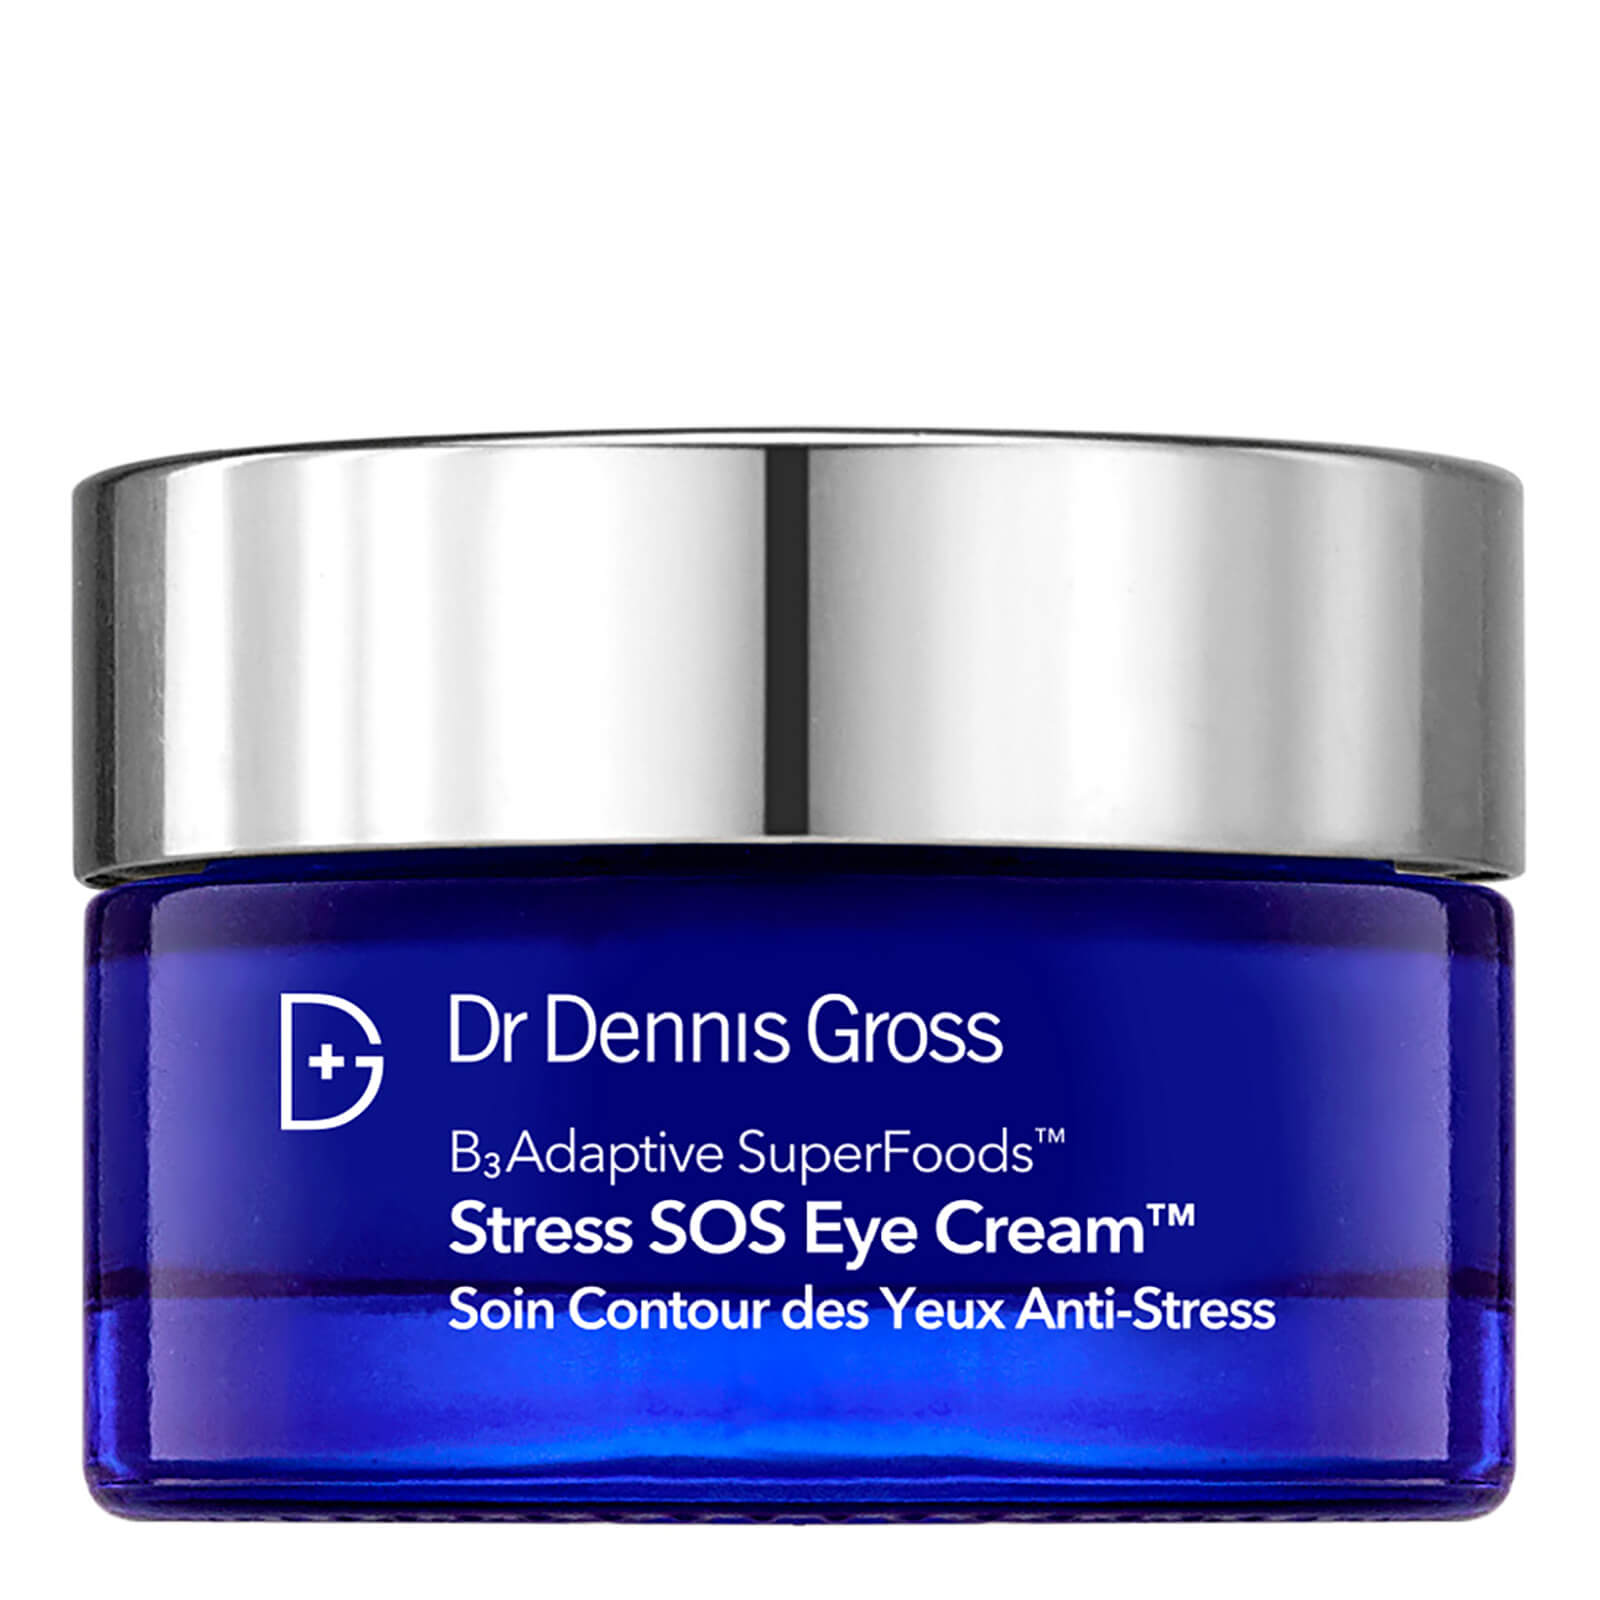 Купить Dr Dennis Gross Skincare B3Adaptive Superfoods Stress SOS Eye Cream 15ml